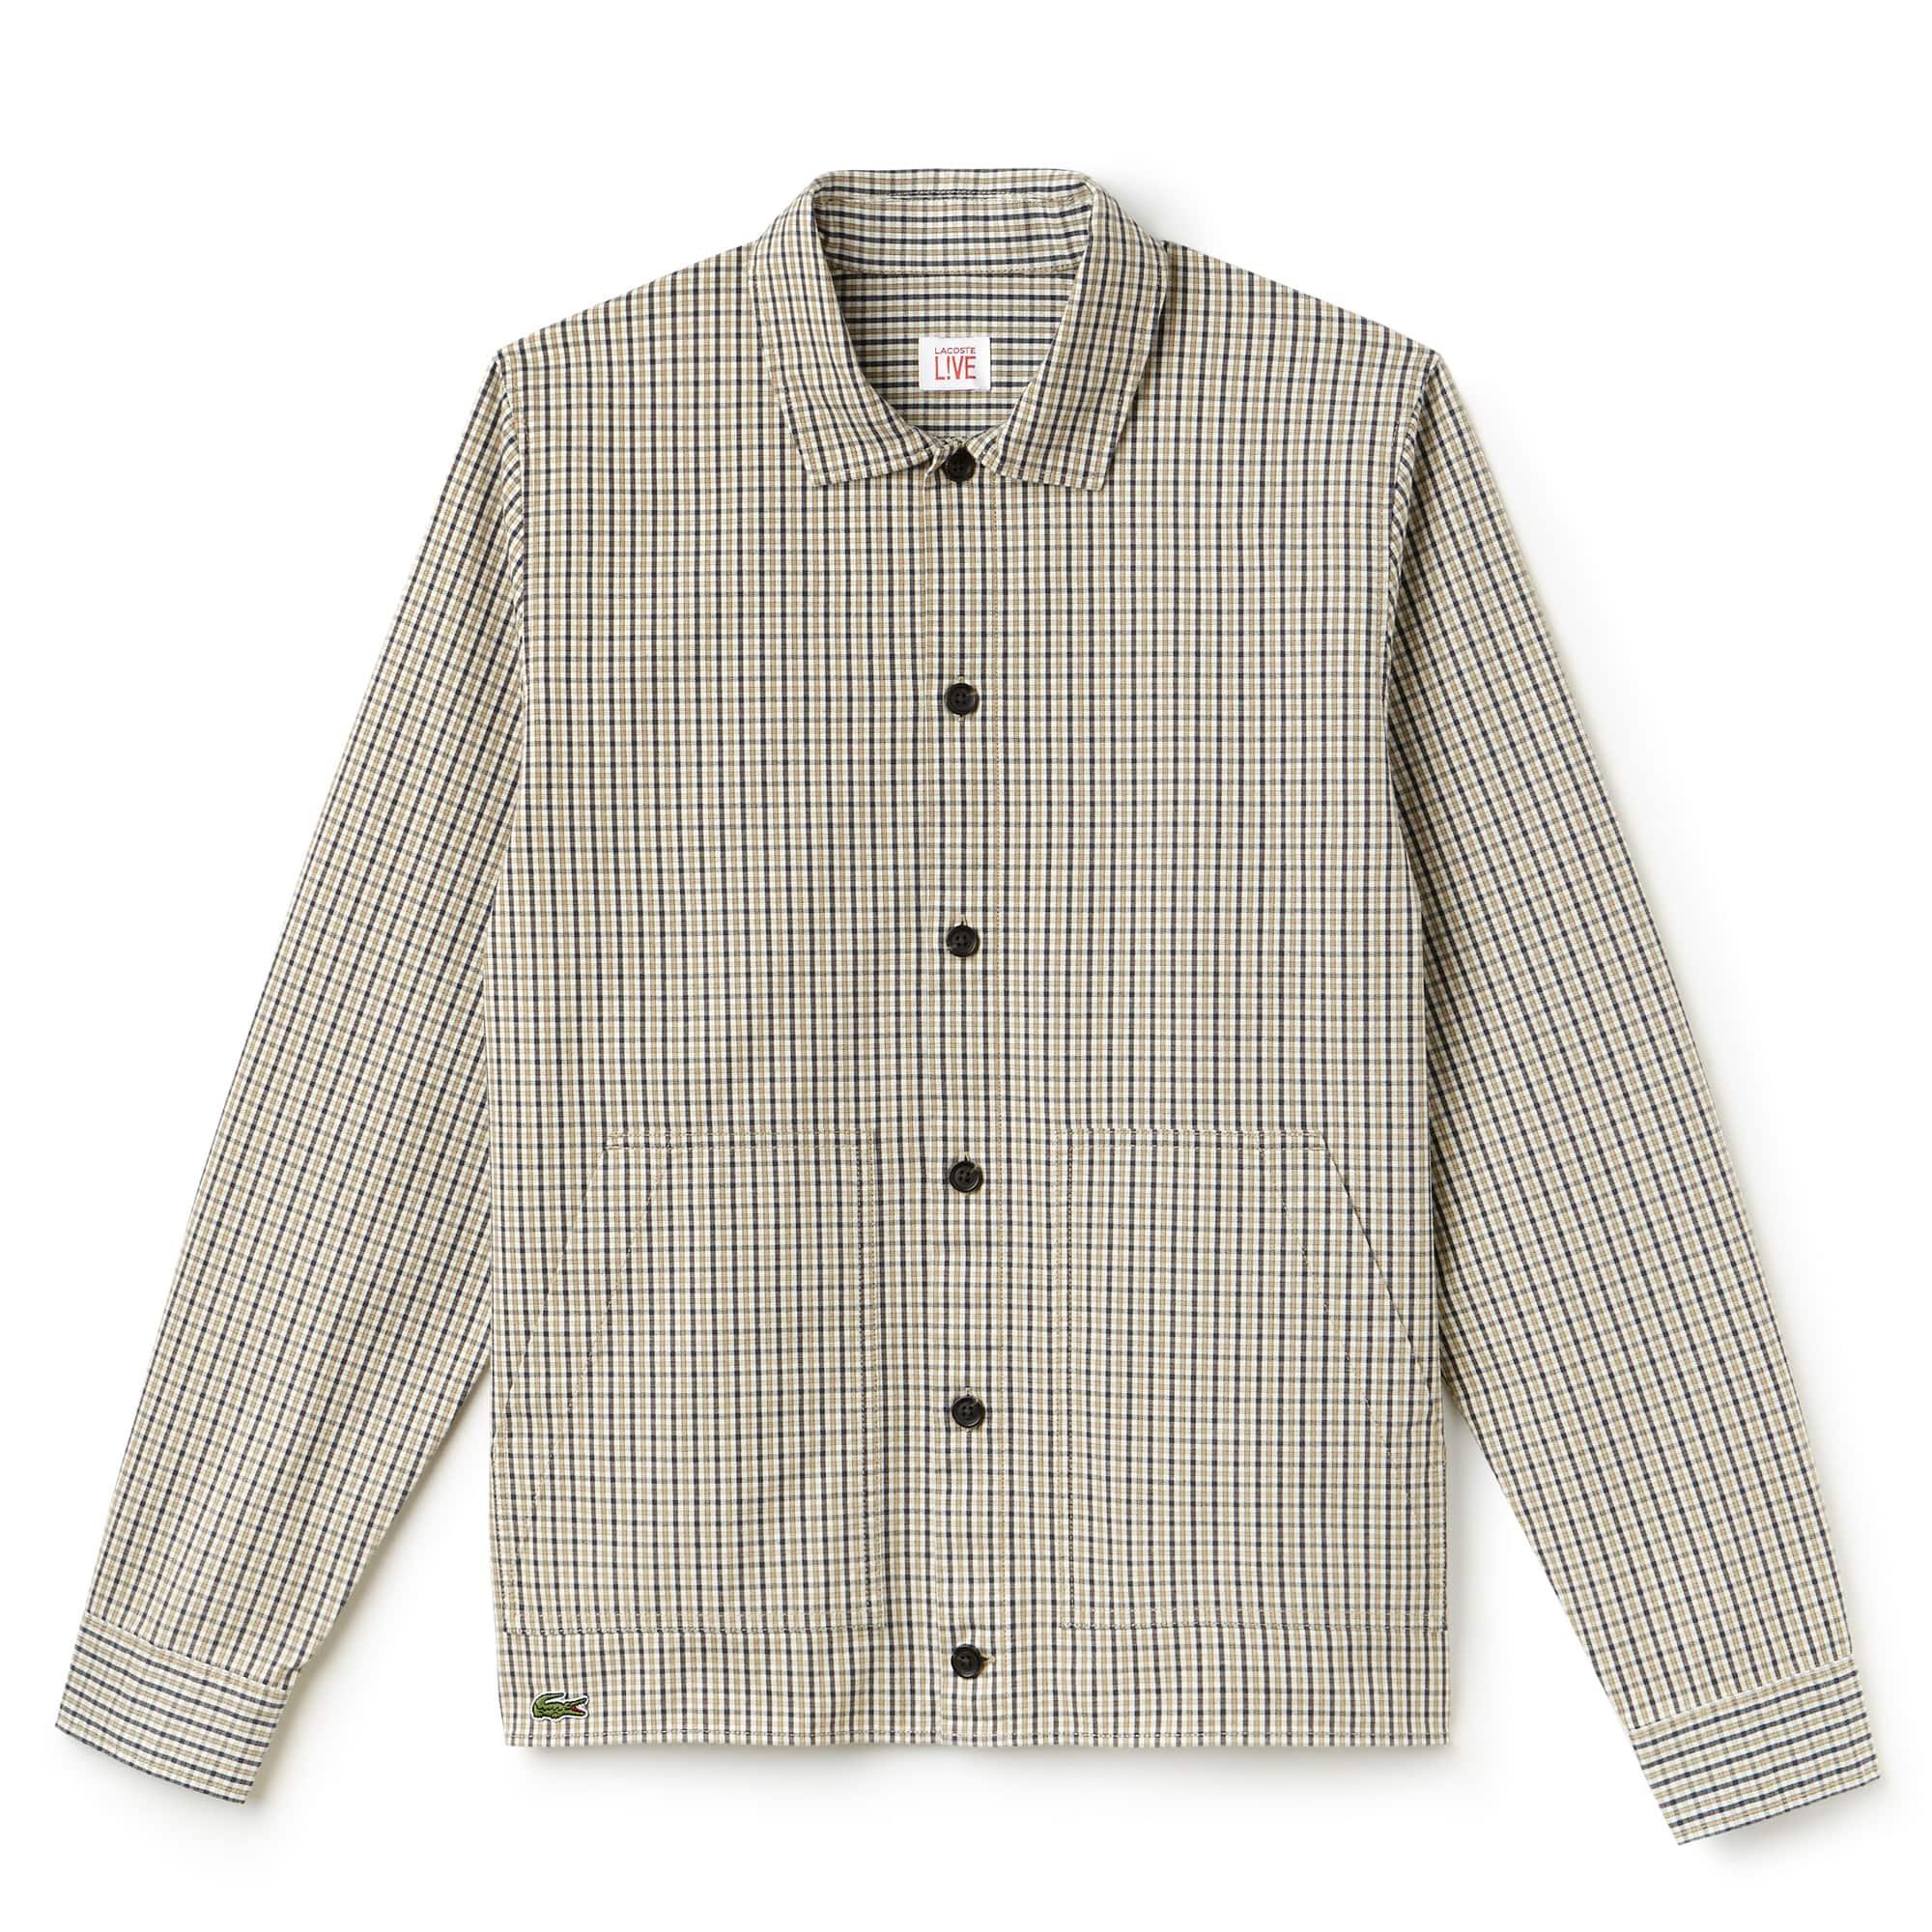 Lacoste LIVE-shirt heren slim fit geruit katoenflanel